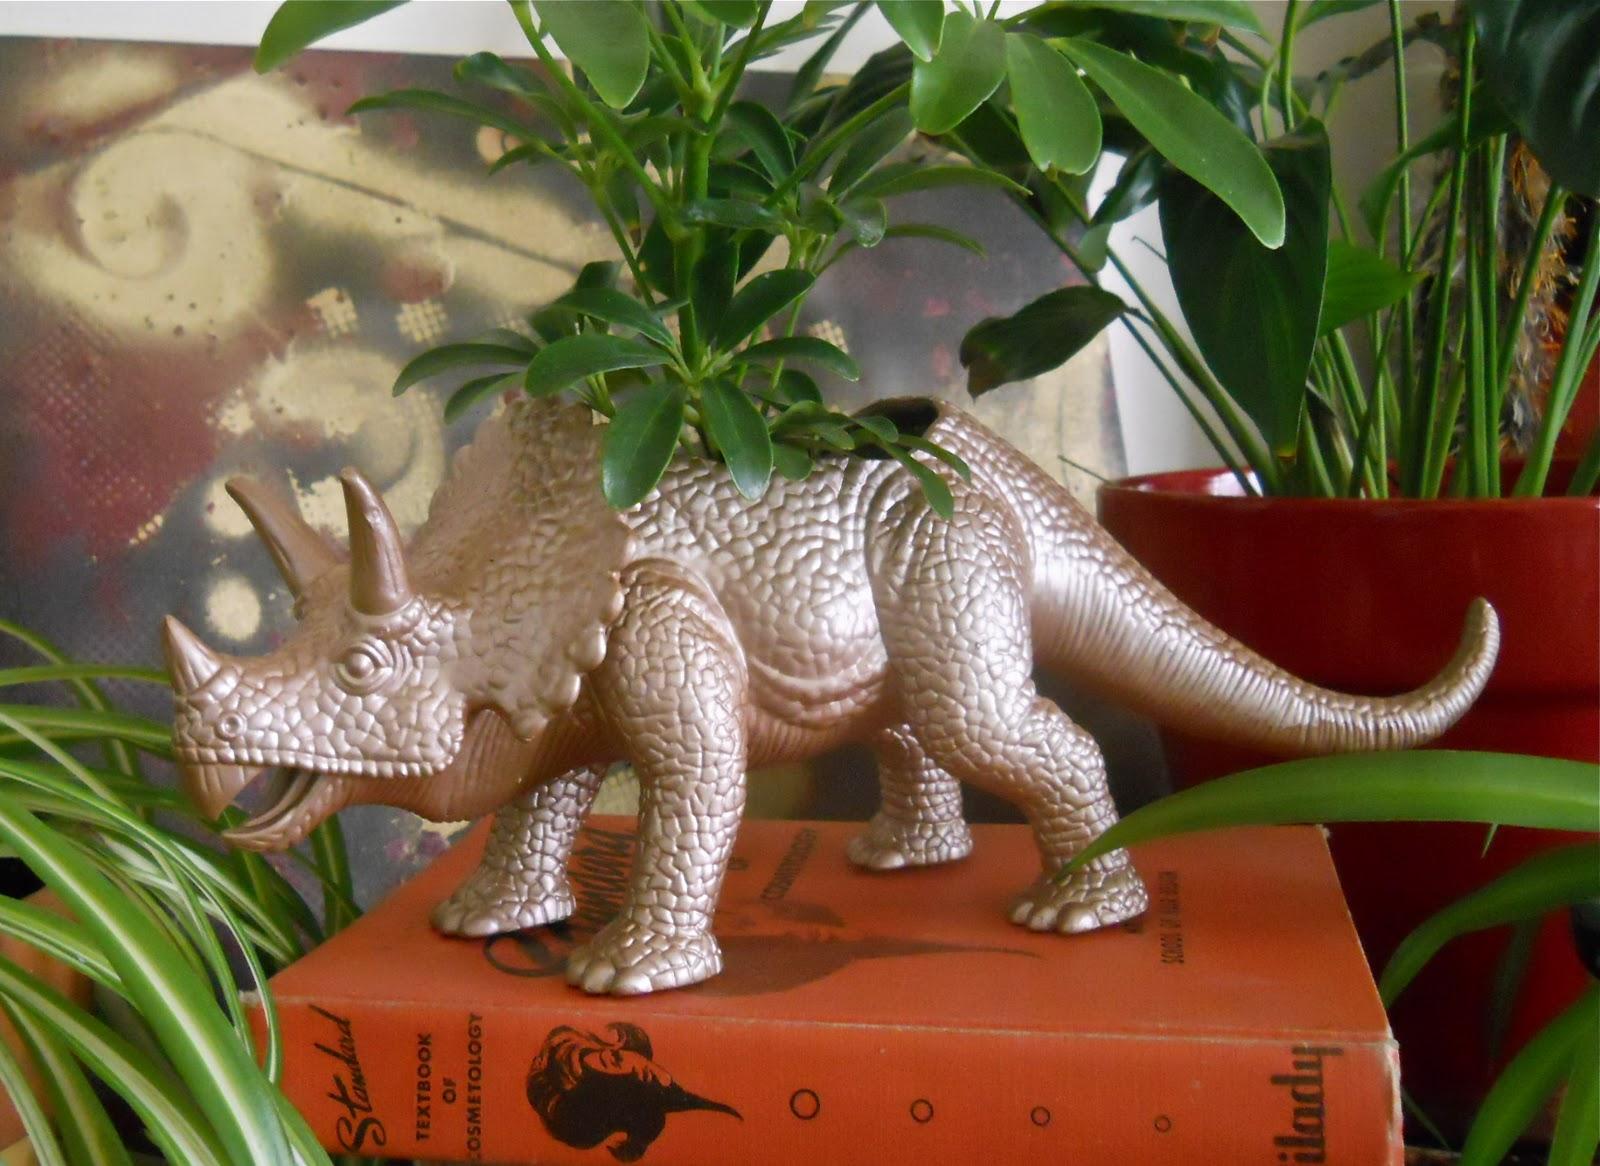 DIY Dinosaur Toy Small Plant Planter